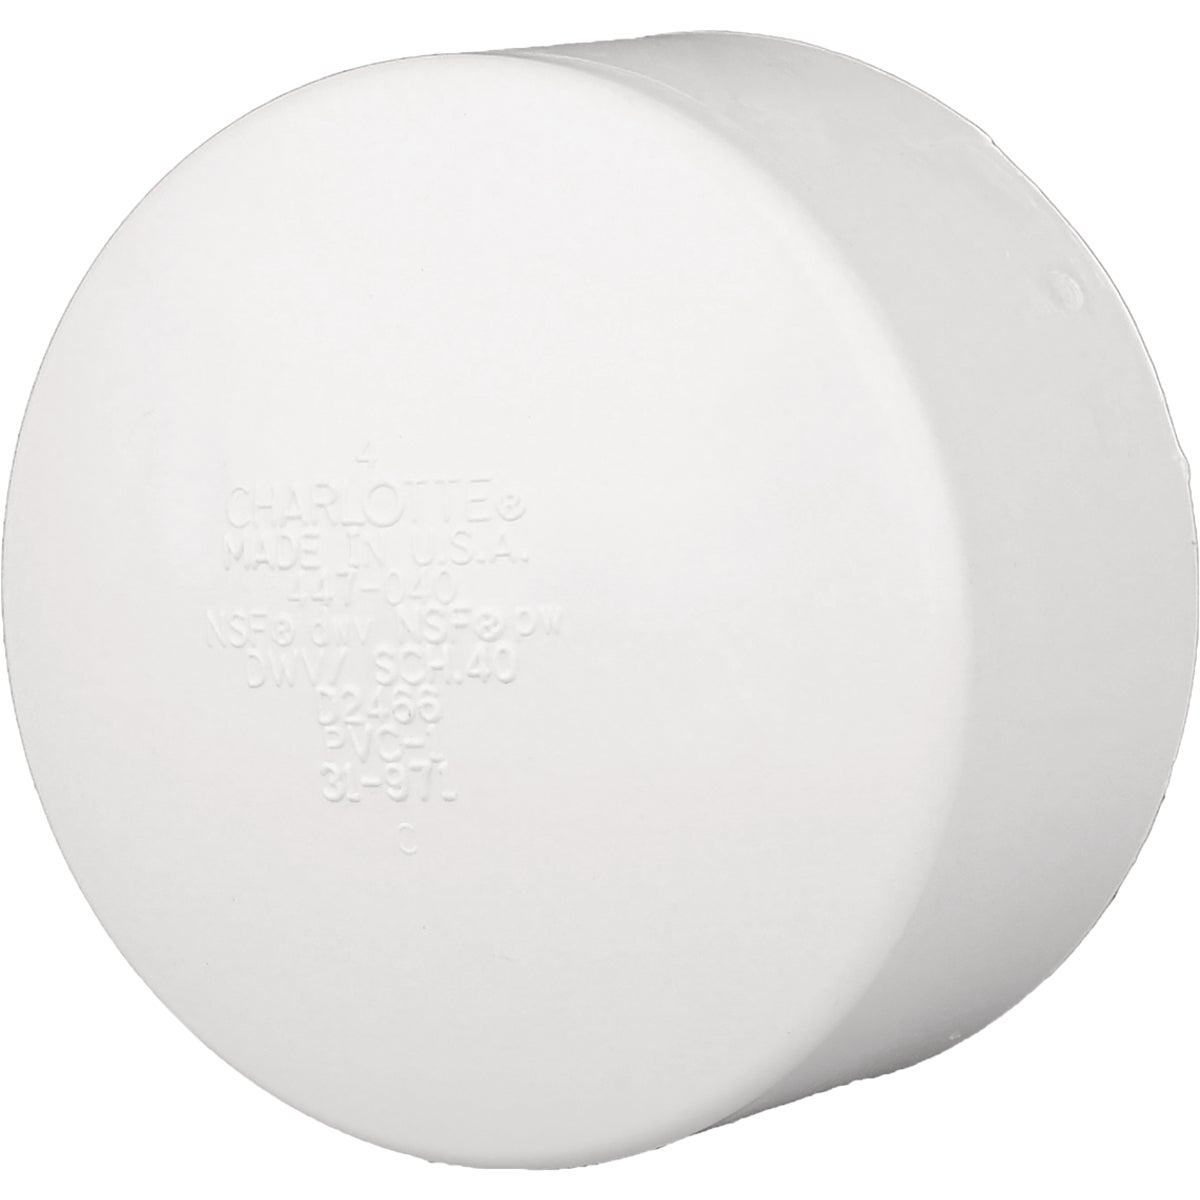 "6"" PVC-DWV CAP"